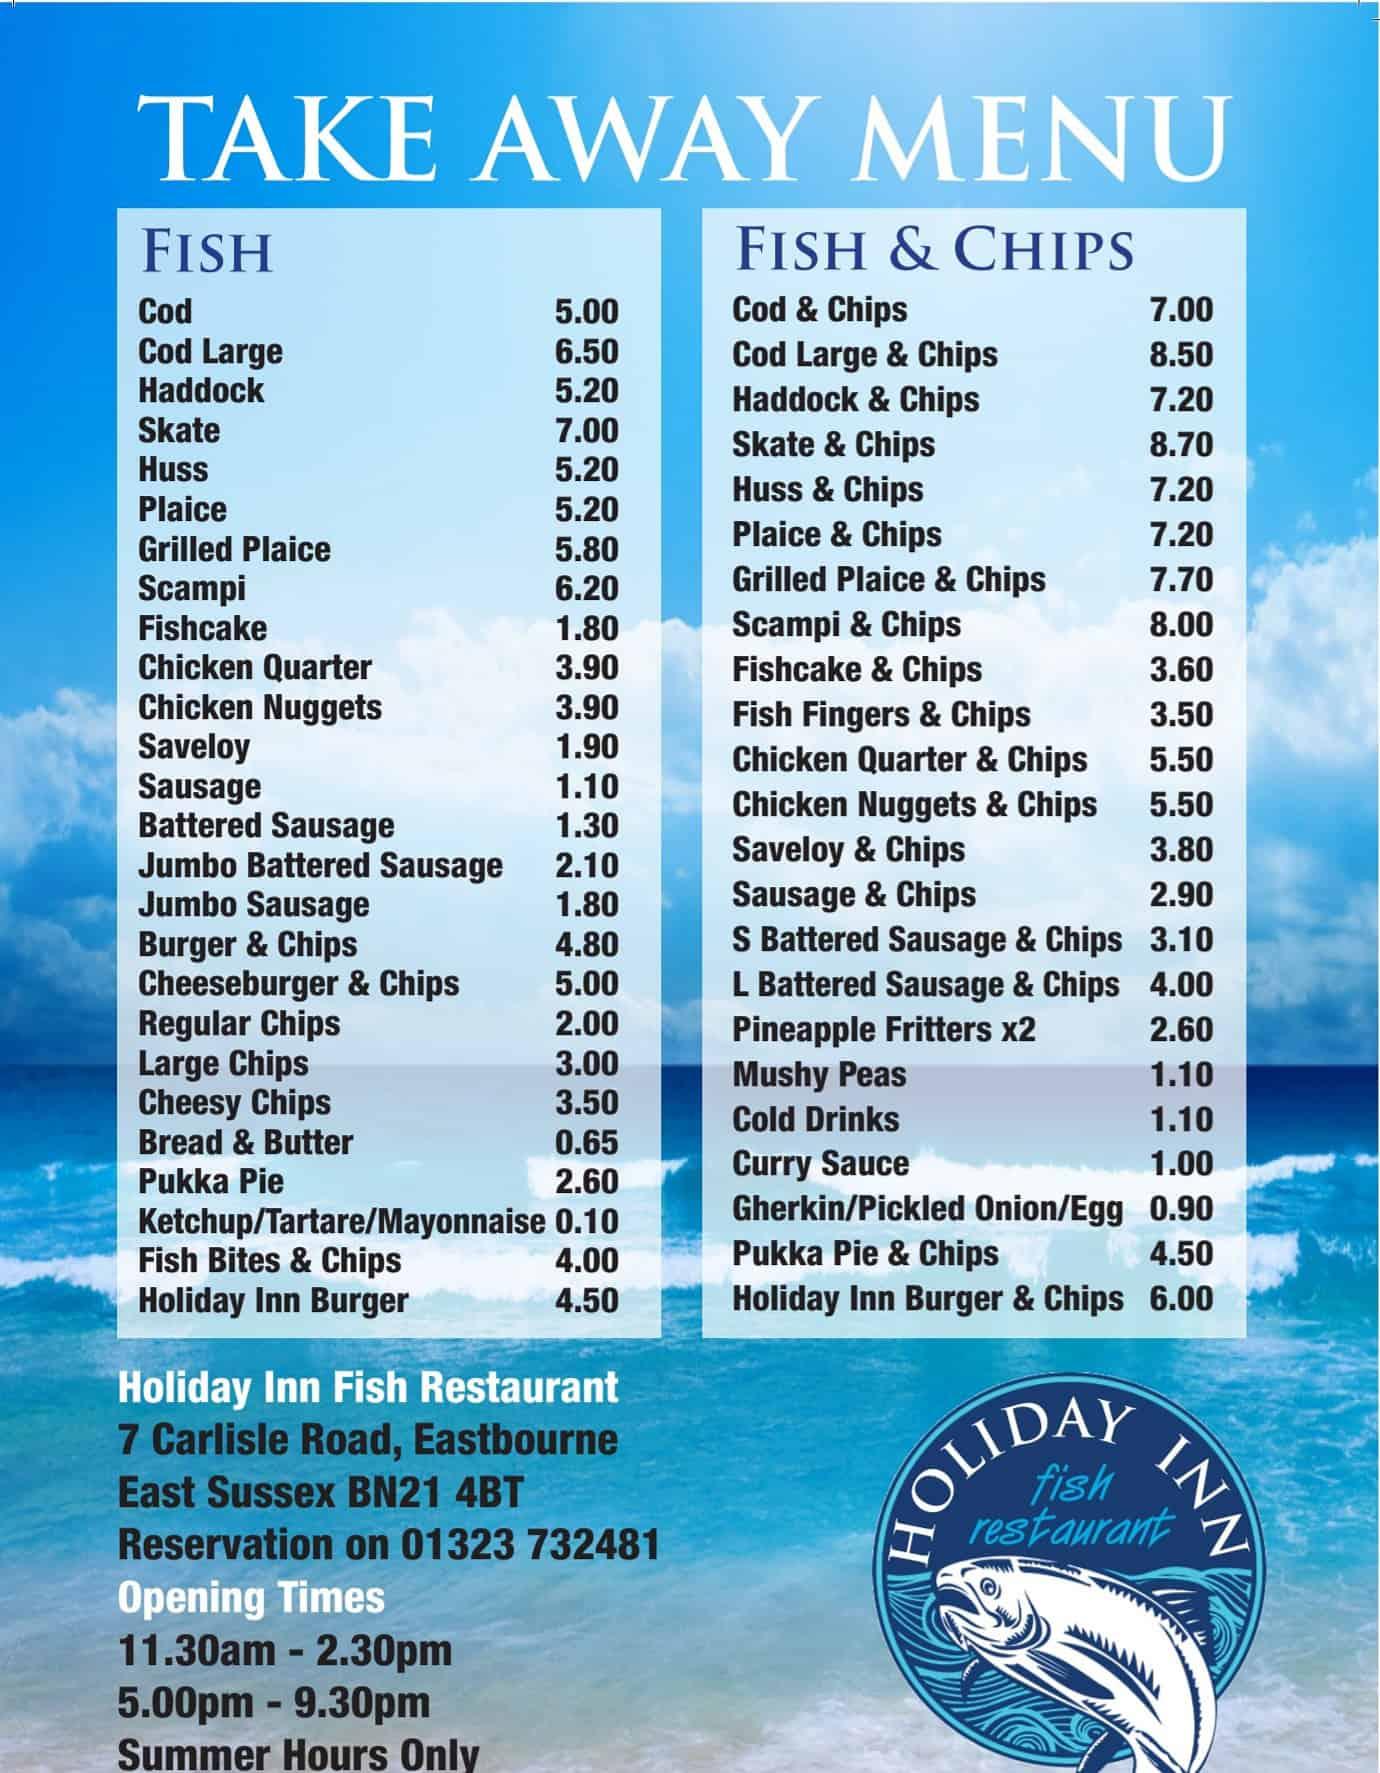 Menu for Holiday Inn Fish Restaurant